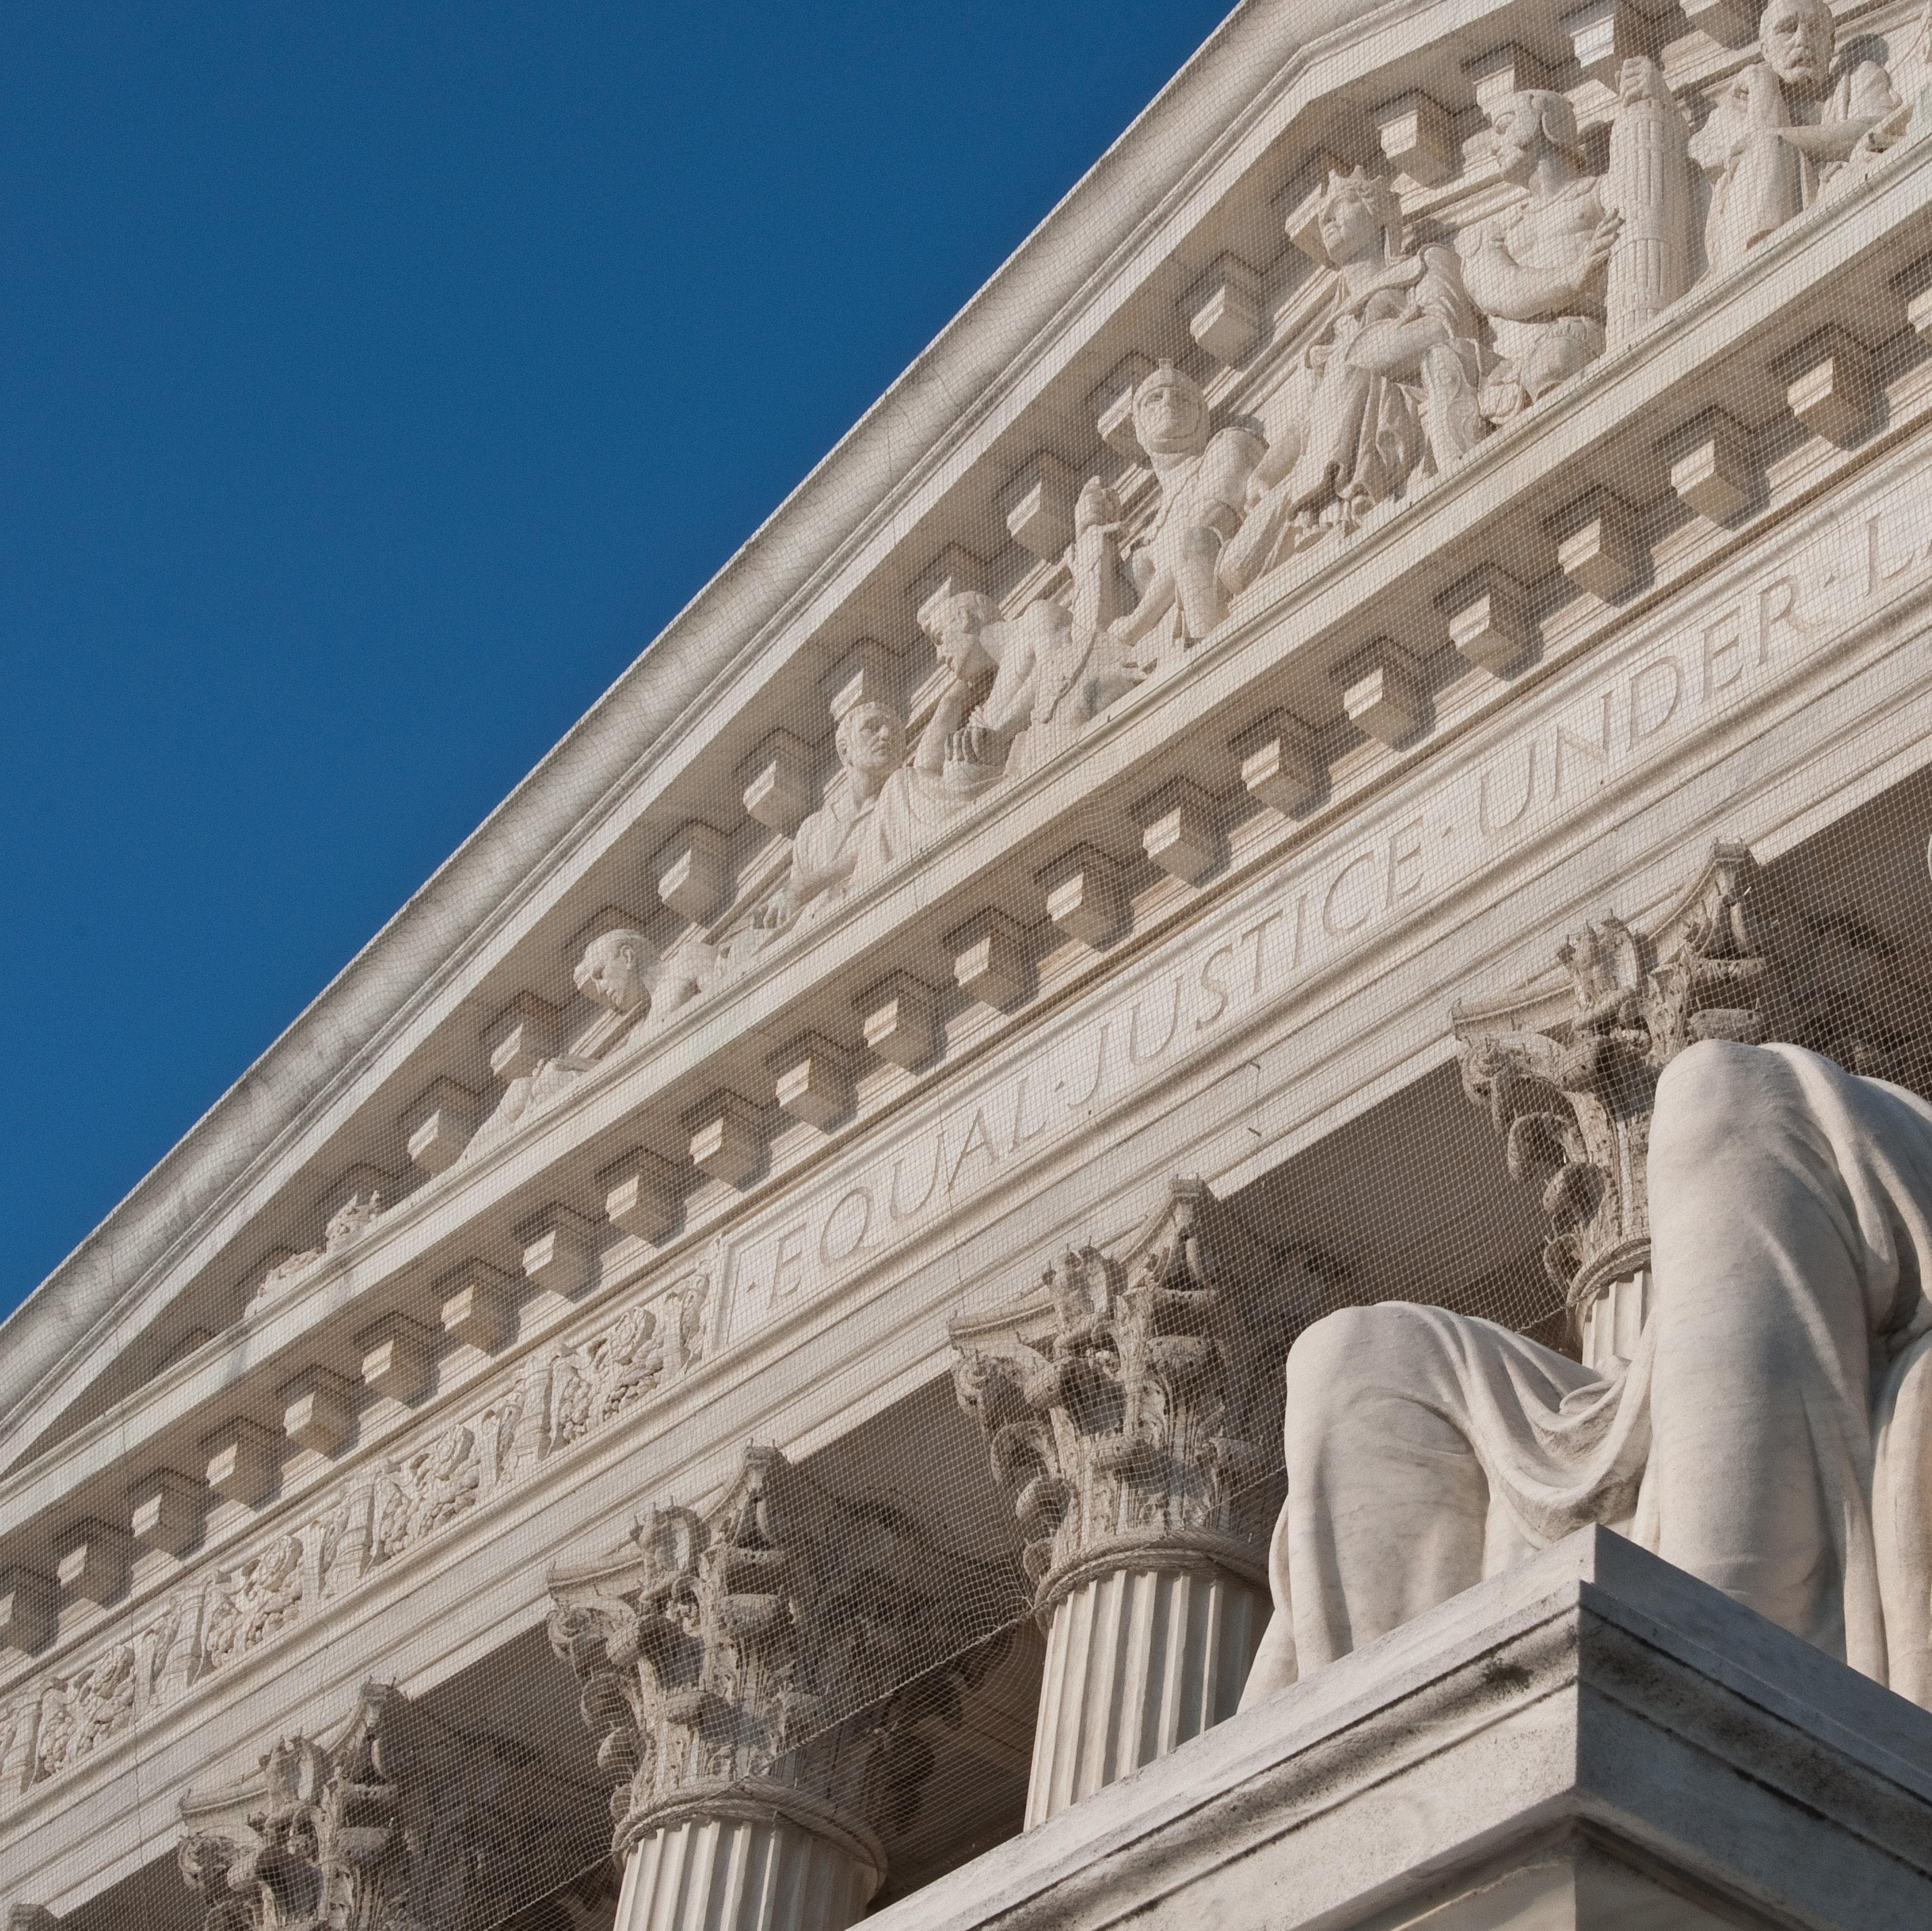 Supreme court nfb86s